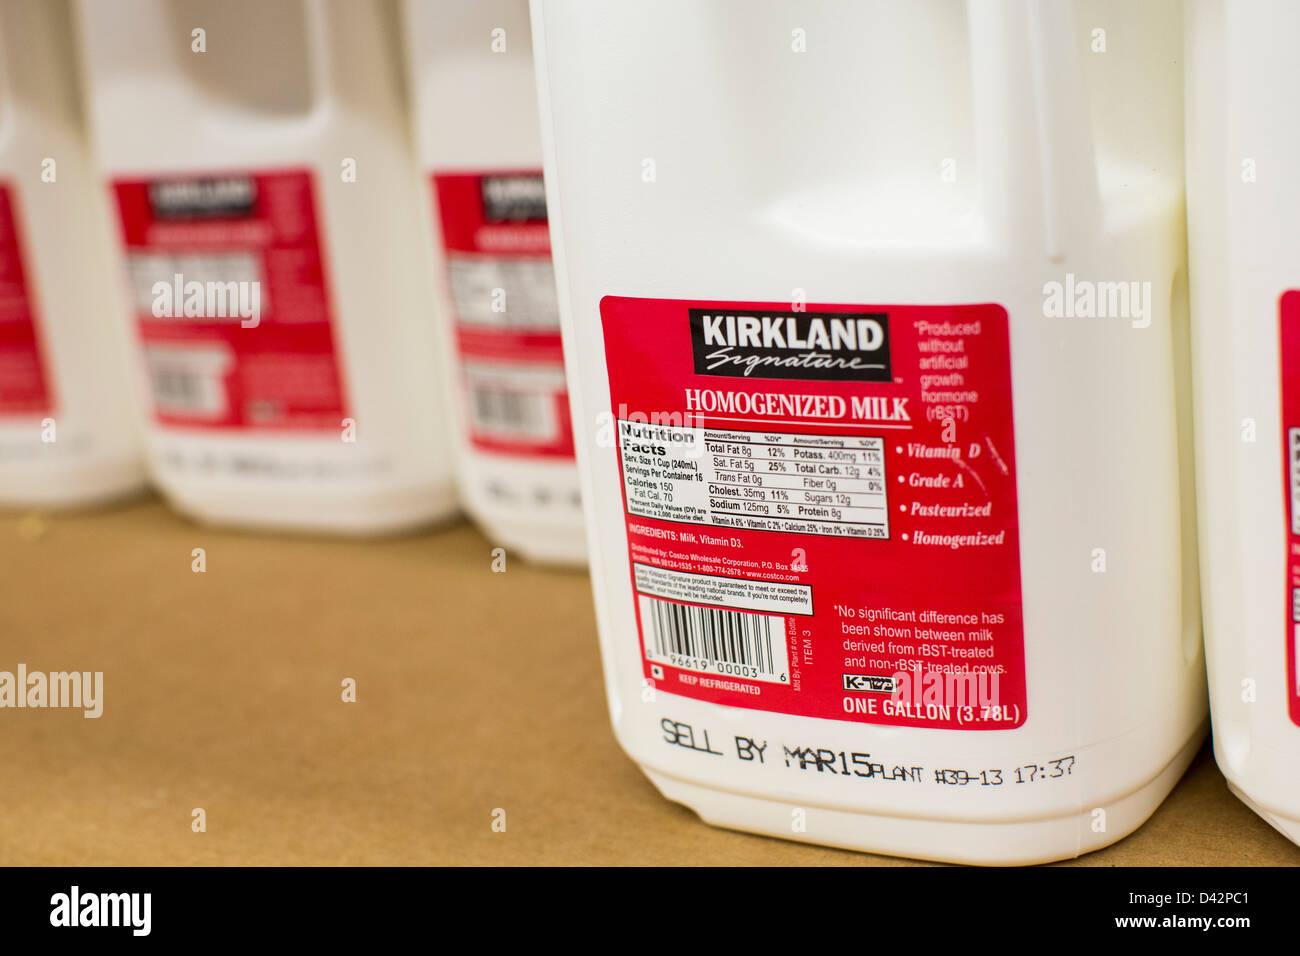 Kirkland milk on display at a costco wholesale warehouse club stock kirkland milk on display at a costco wholesale warehouse club thecheapjerseys Images